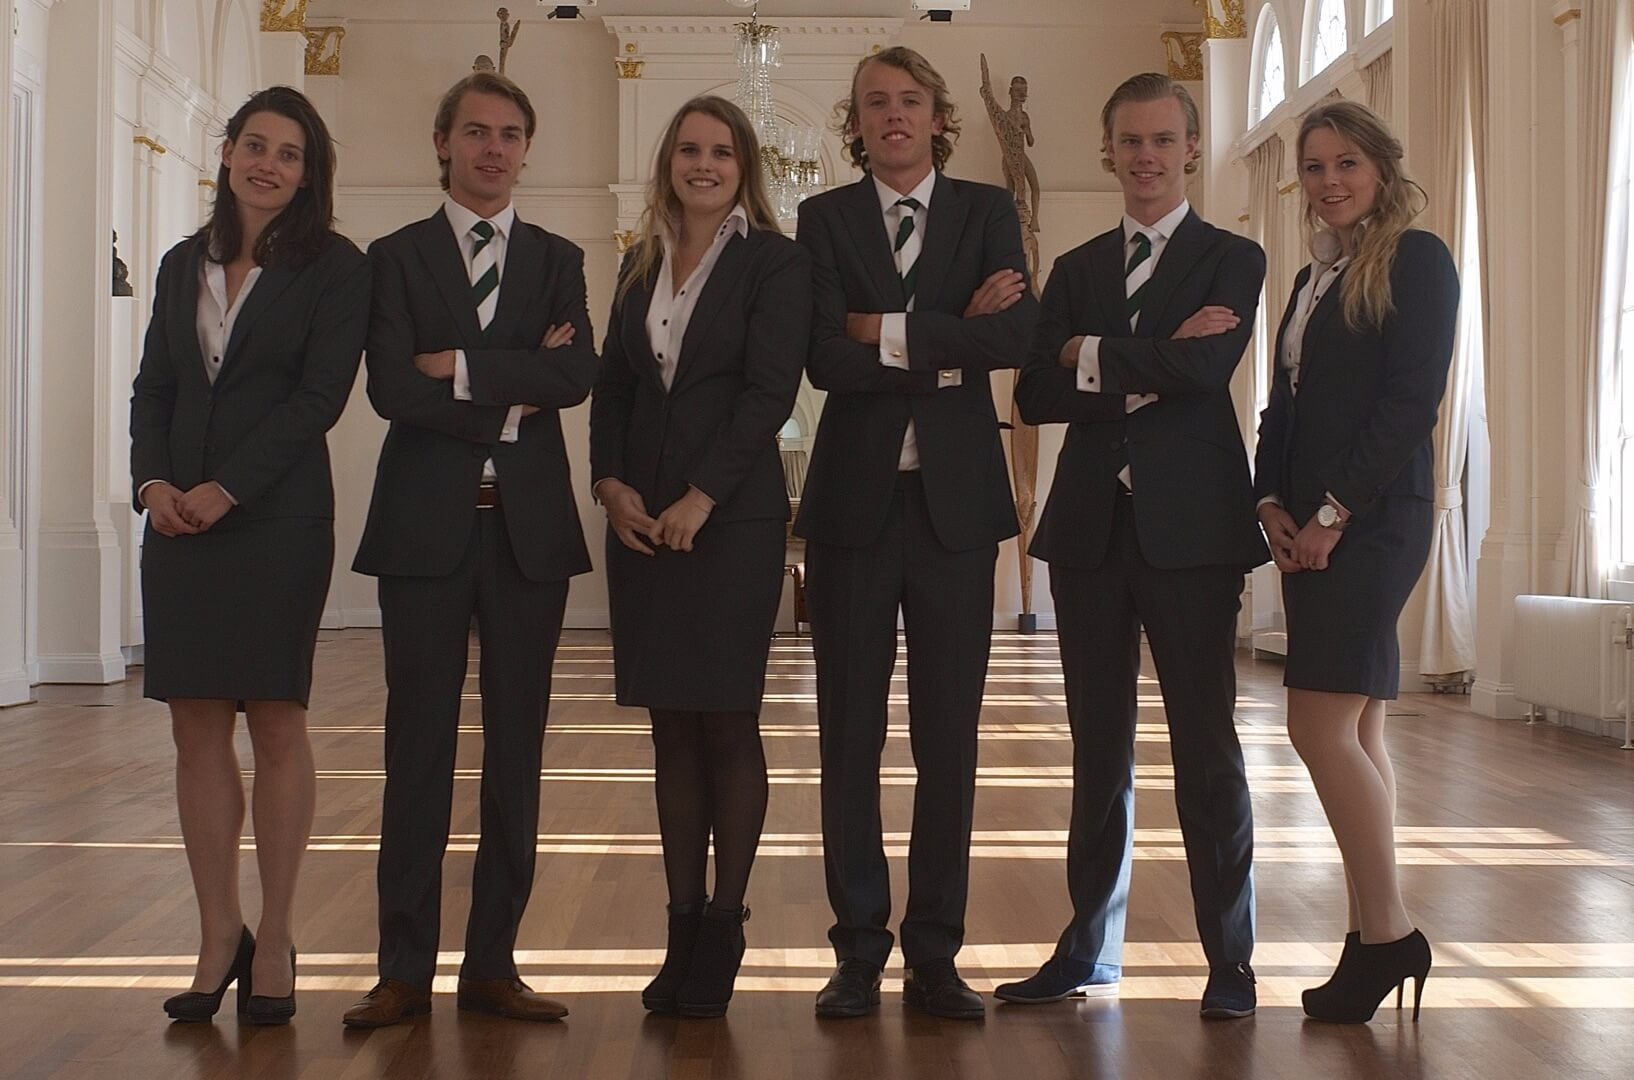 Chr.-Taxateurs-2013 Pak Student Bestuur Vereniging De Oost Bespoke Academy.jpg